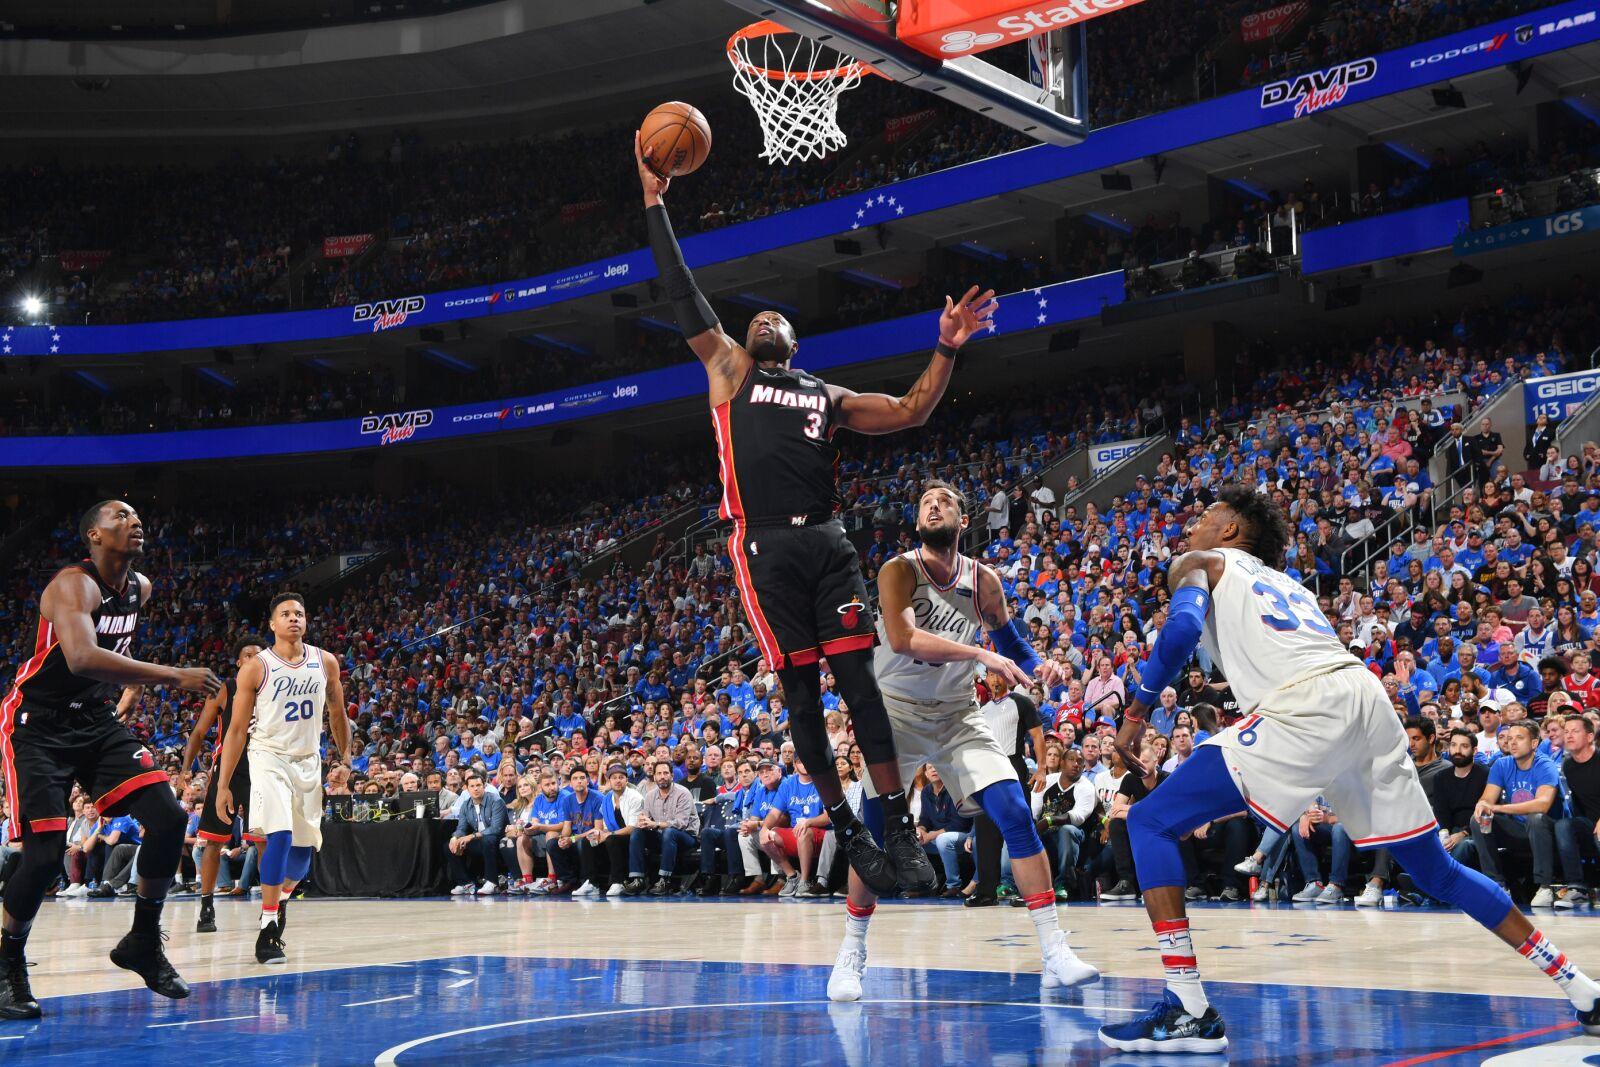 Miami Heat: 3 takeaways from Game 1 vs Philadelphia 76ers